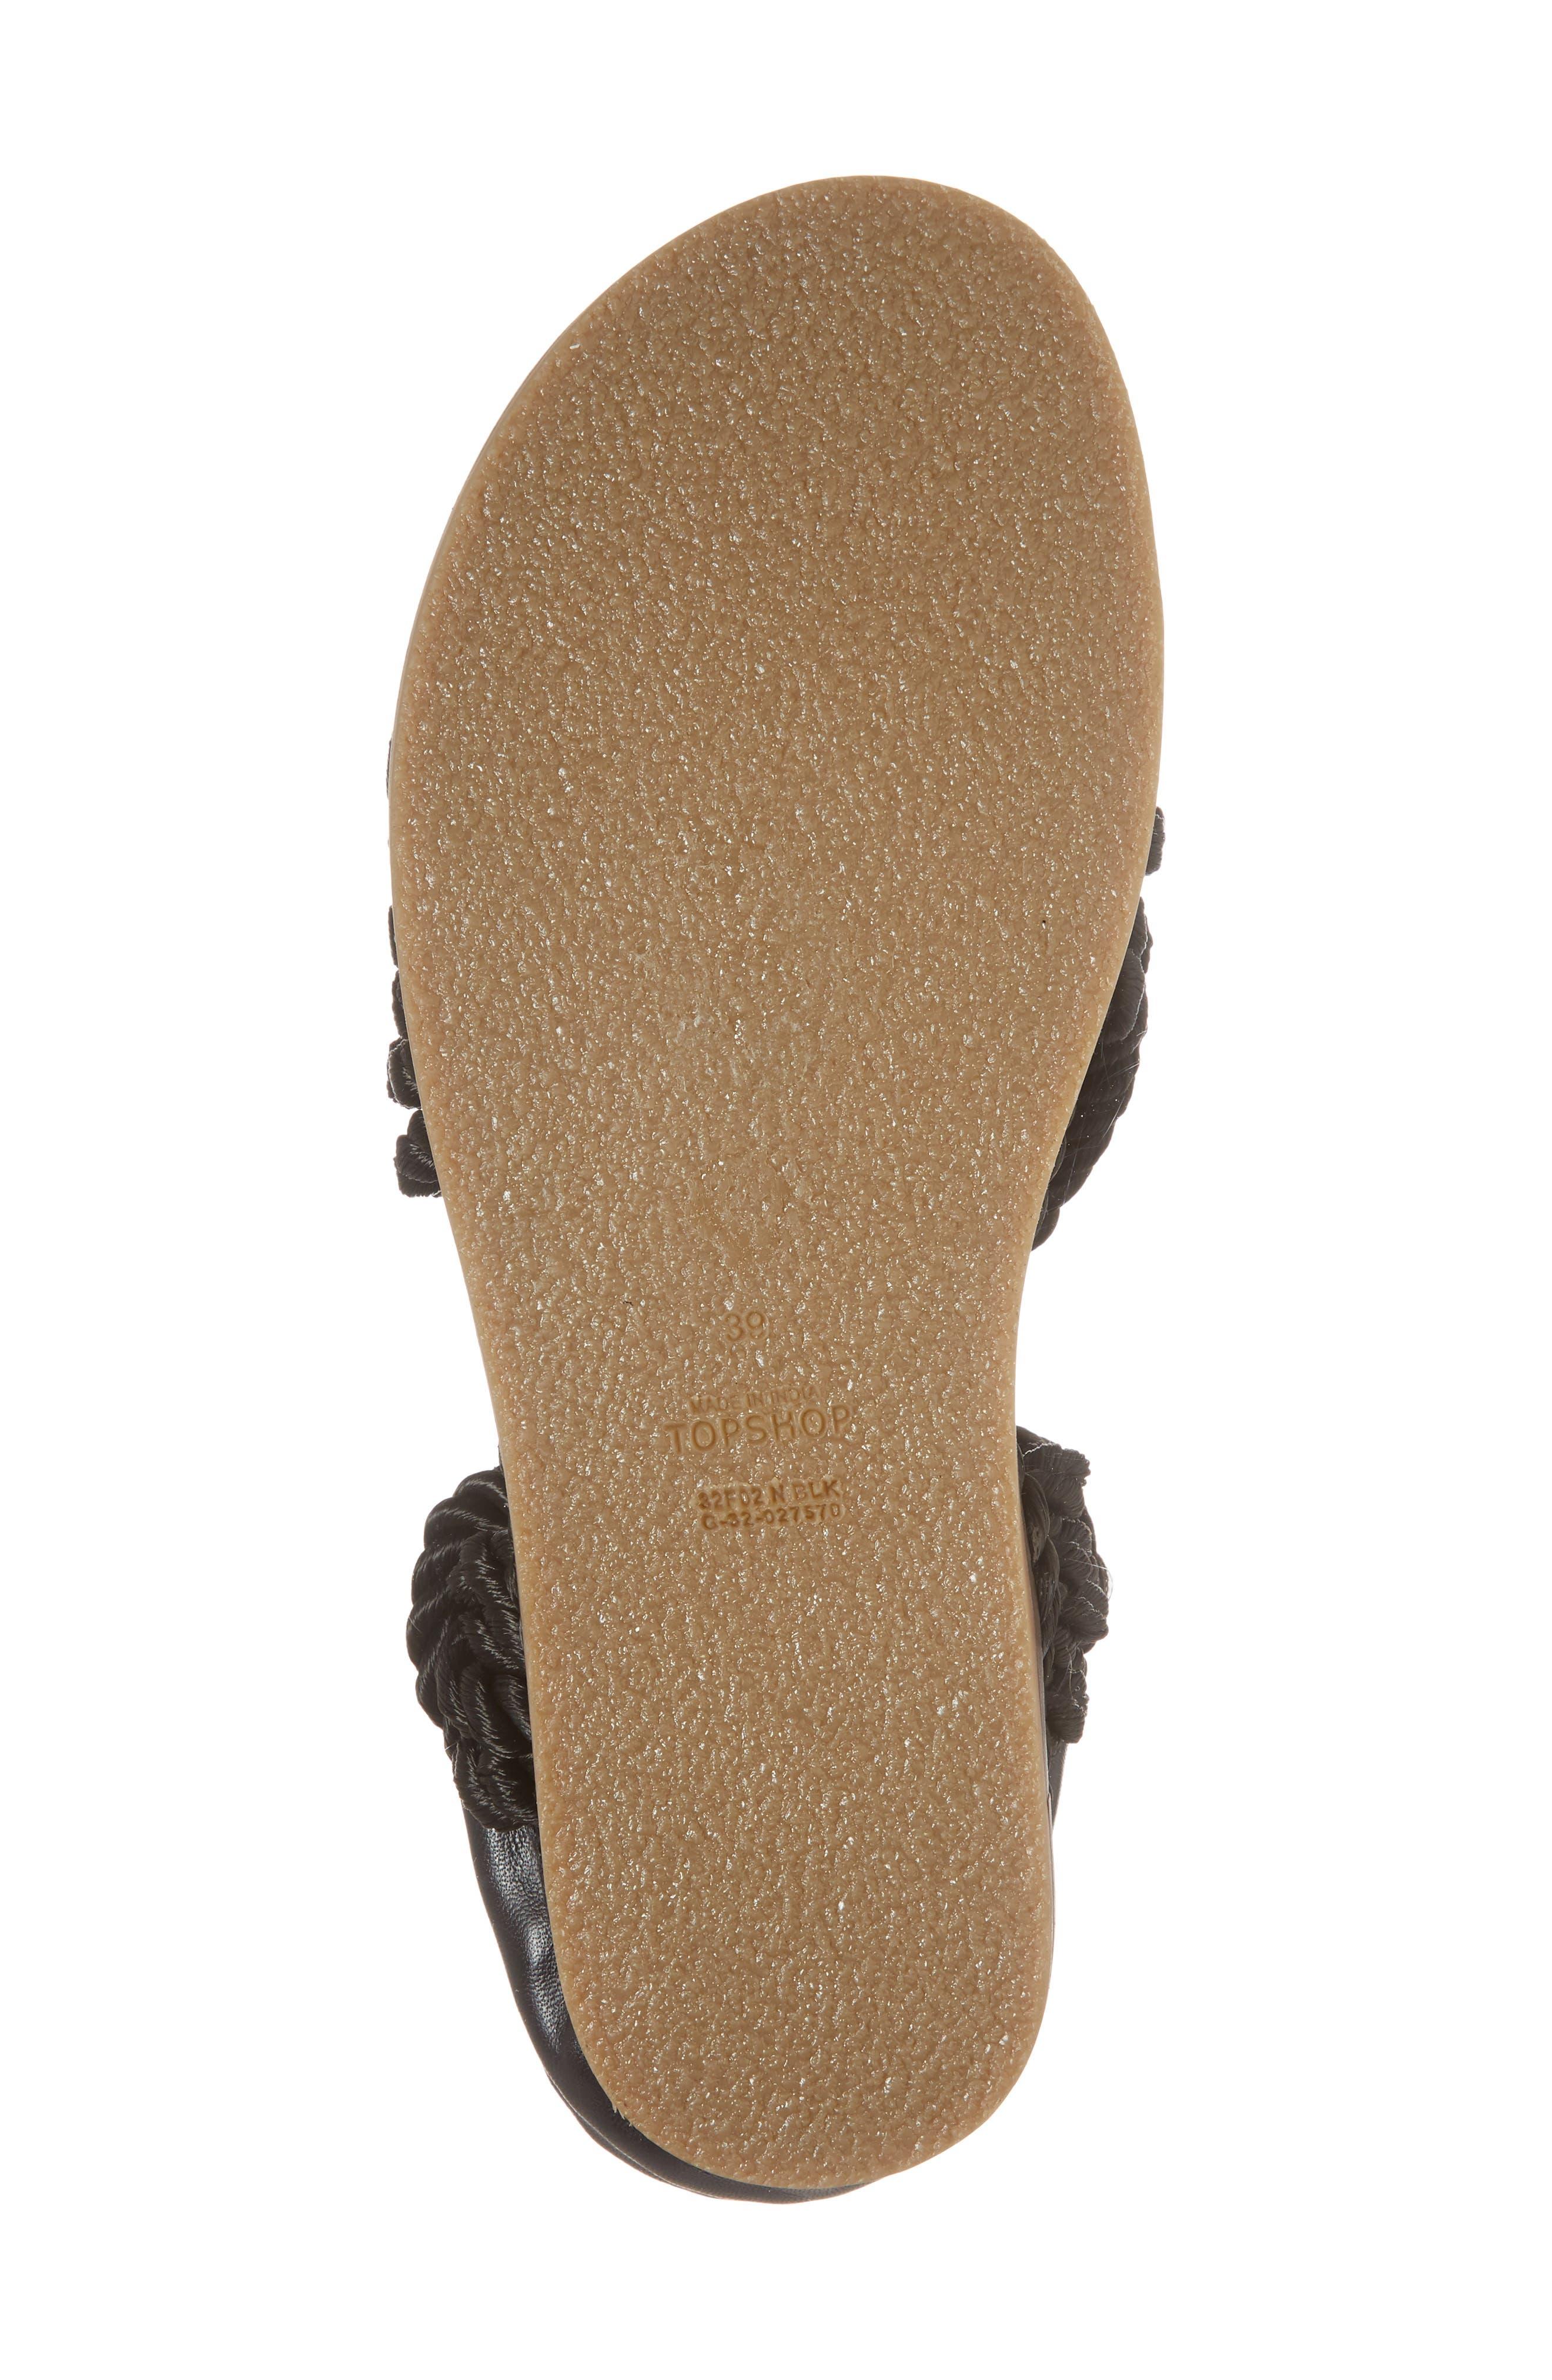 Fiesta Rope Flat Sandal,                             Alternate thumbnail 6, color,                             001